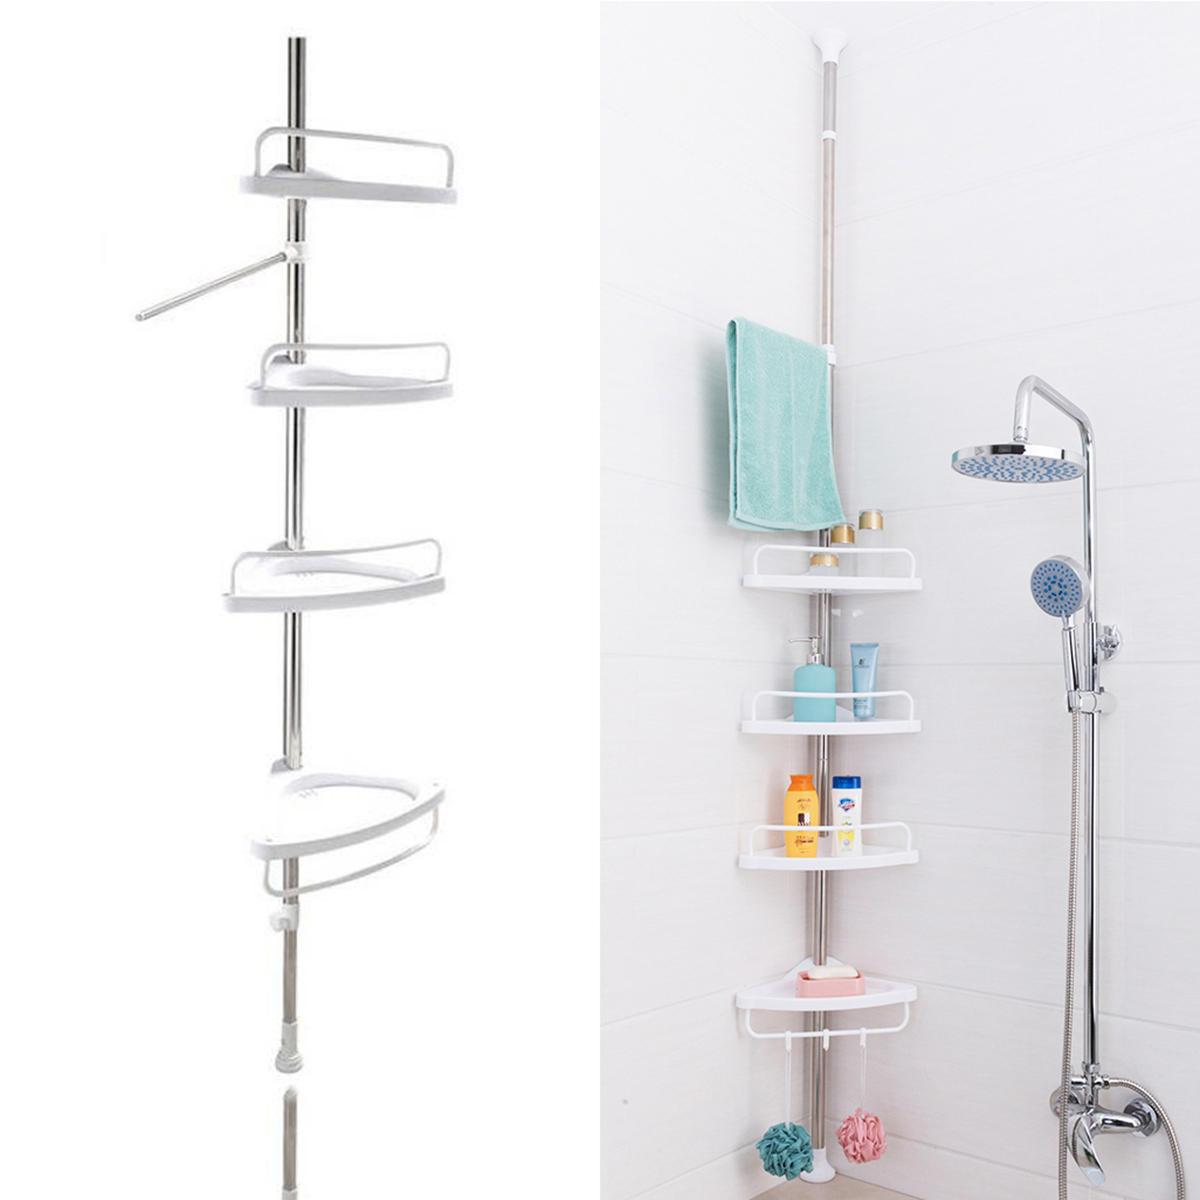 Adjustable 4 Tier Bathroom Corner Shower Shelf Rack Wall Corner Rack Storage Holder Space Saving Organiser